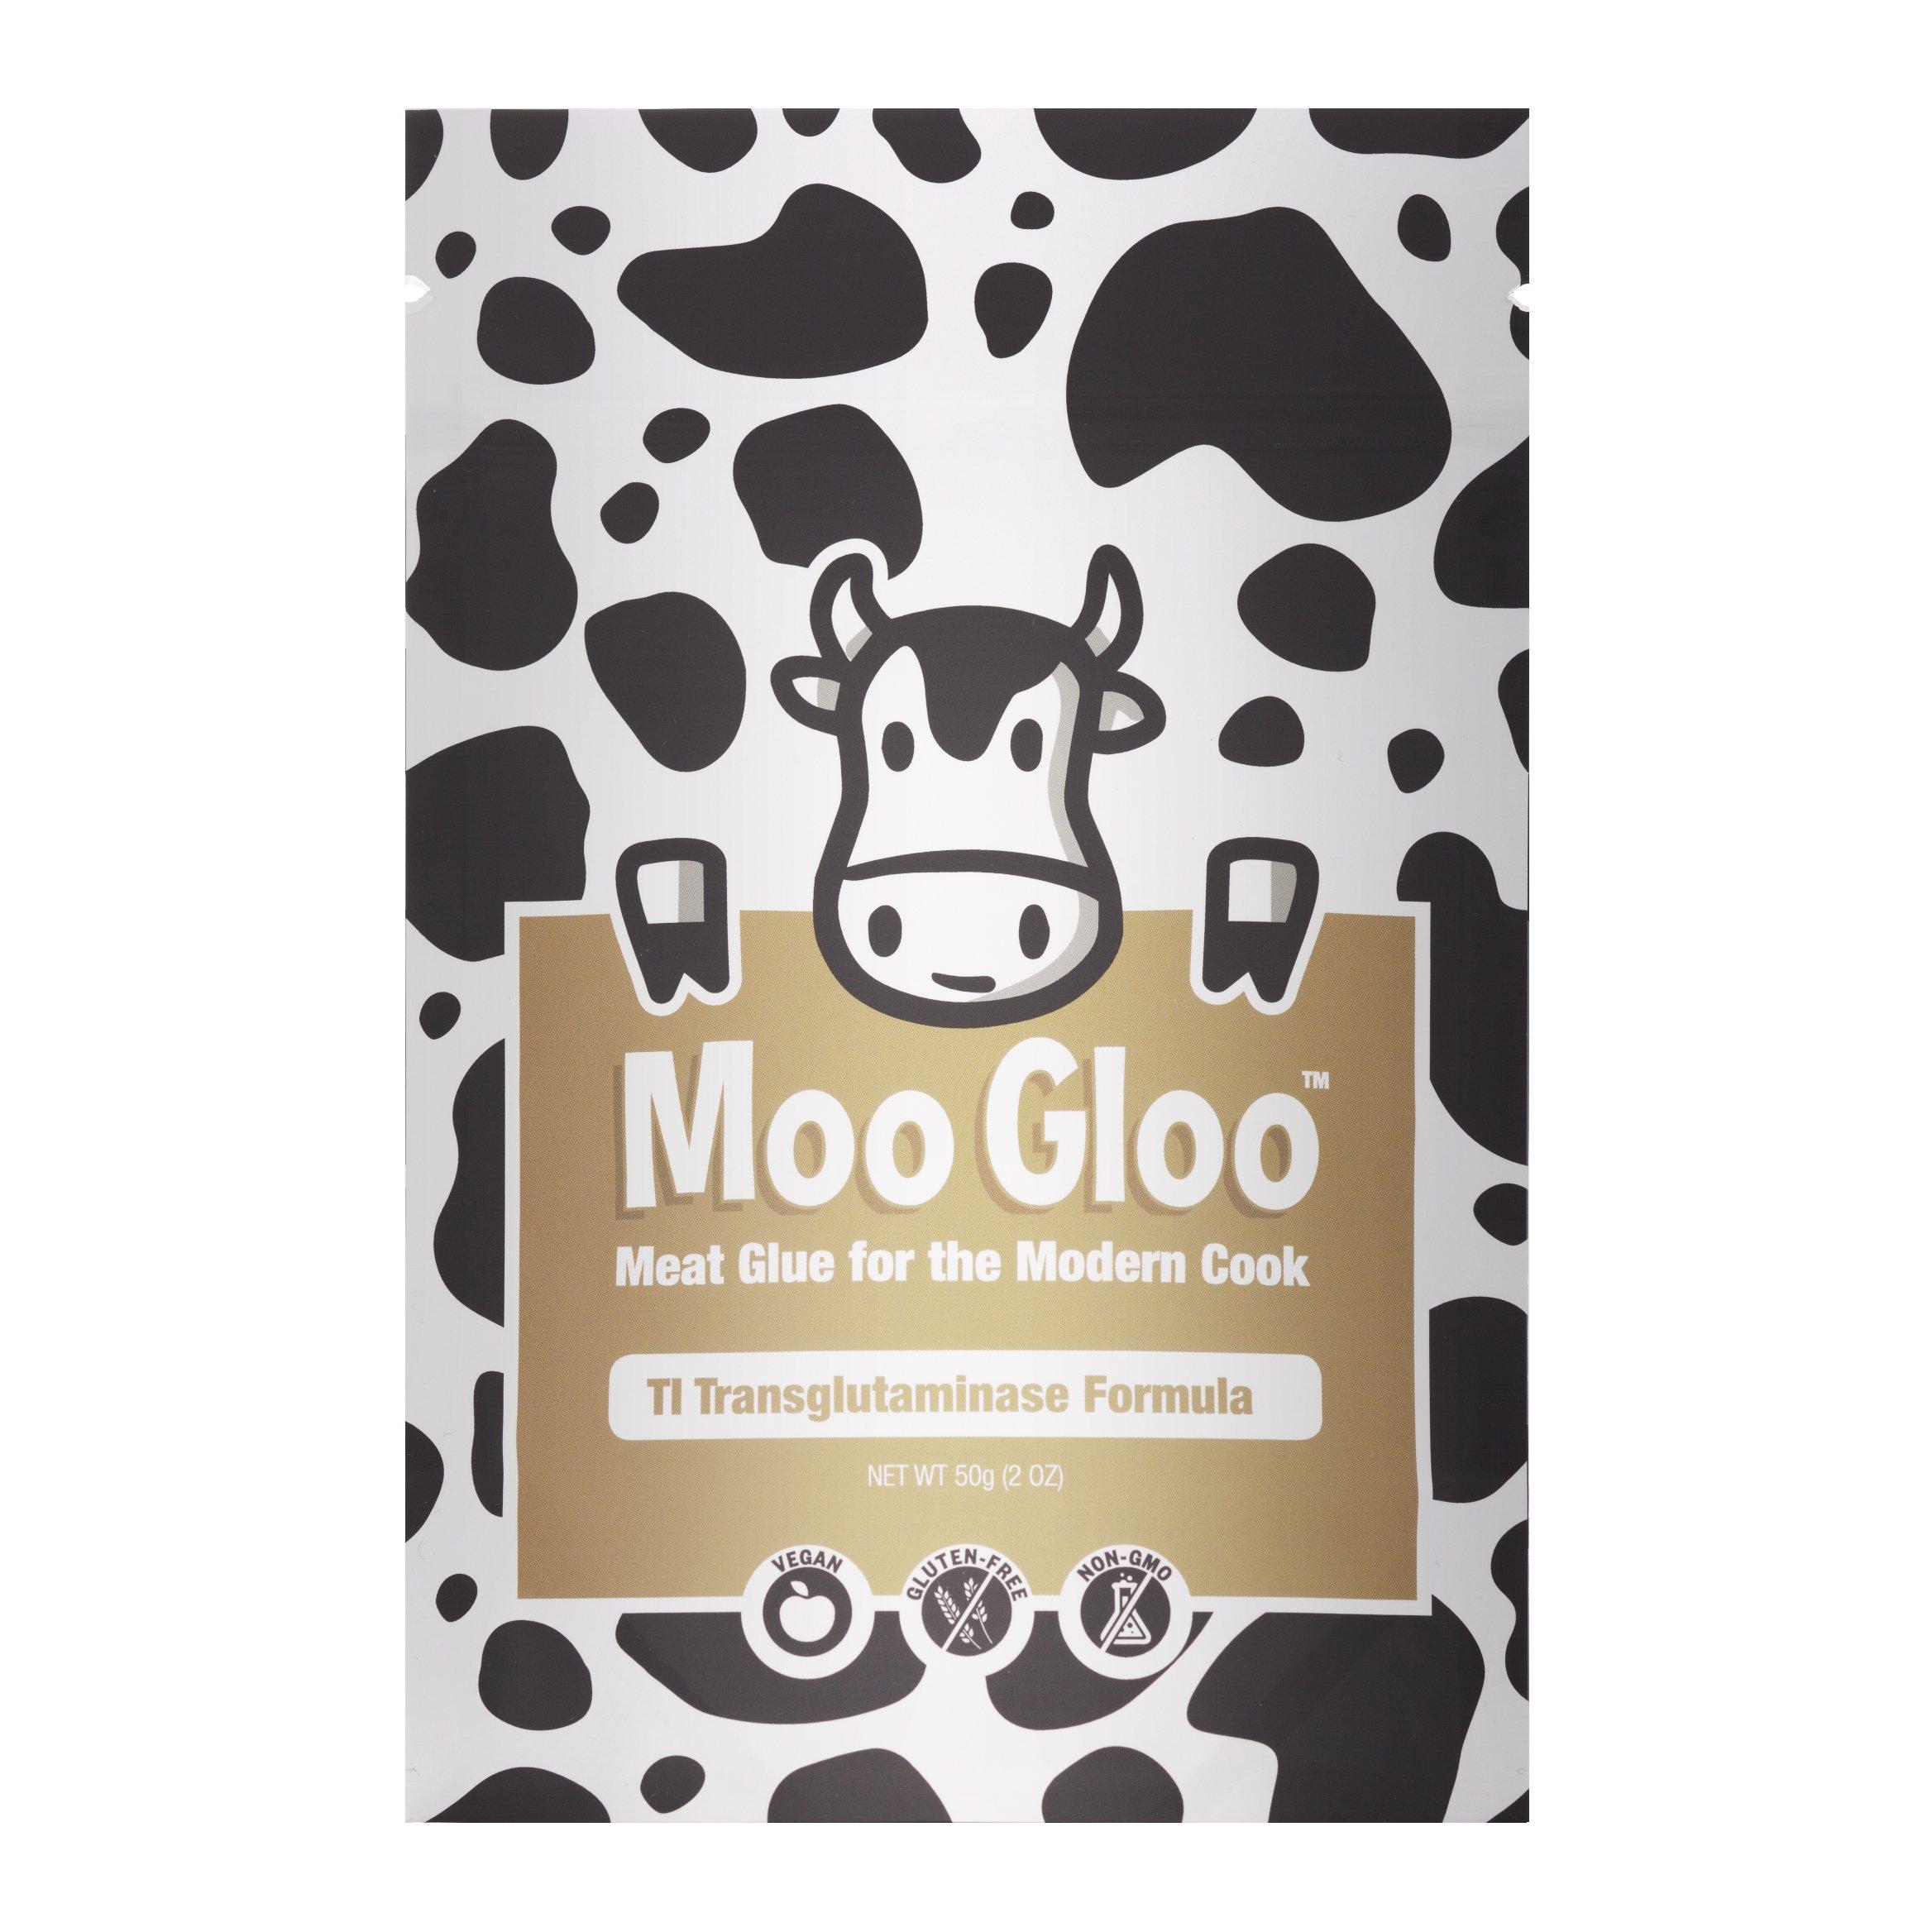 Moo Gloo Value Pack - Transglutaminase - Meat Glue - 150g/6oz. (Bundle with 3 items) by Moo Gloo (Image #4)